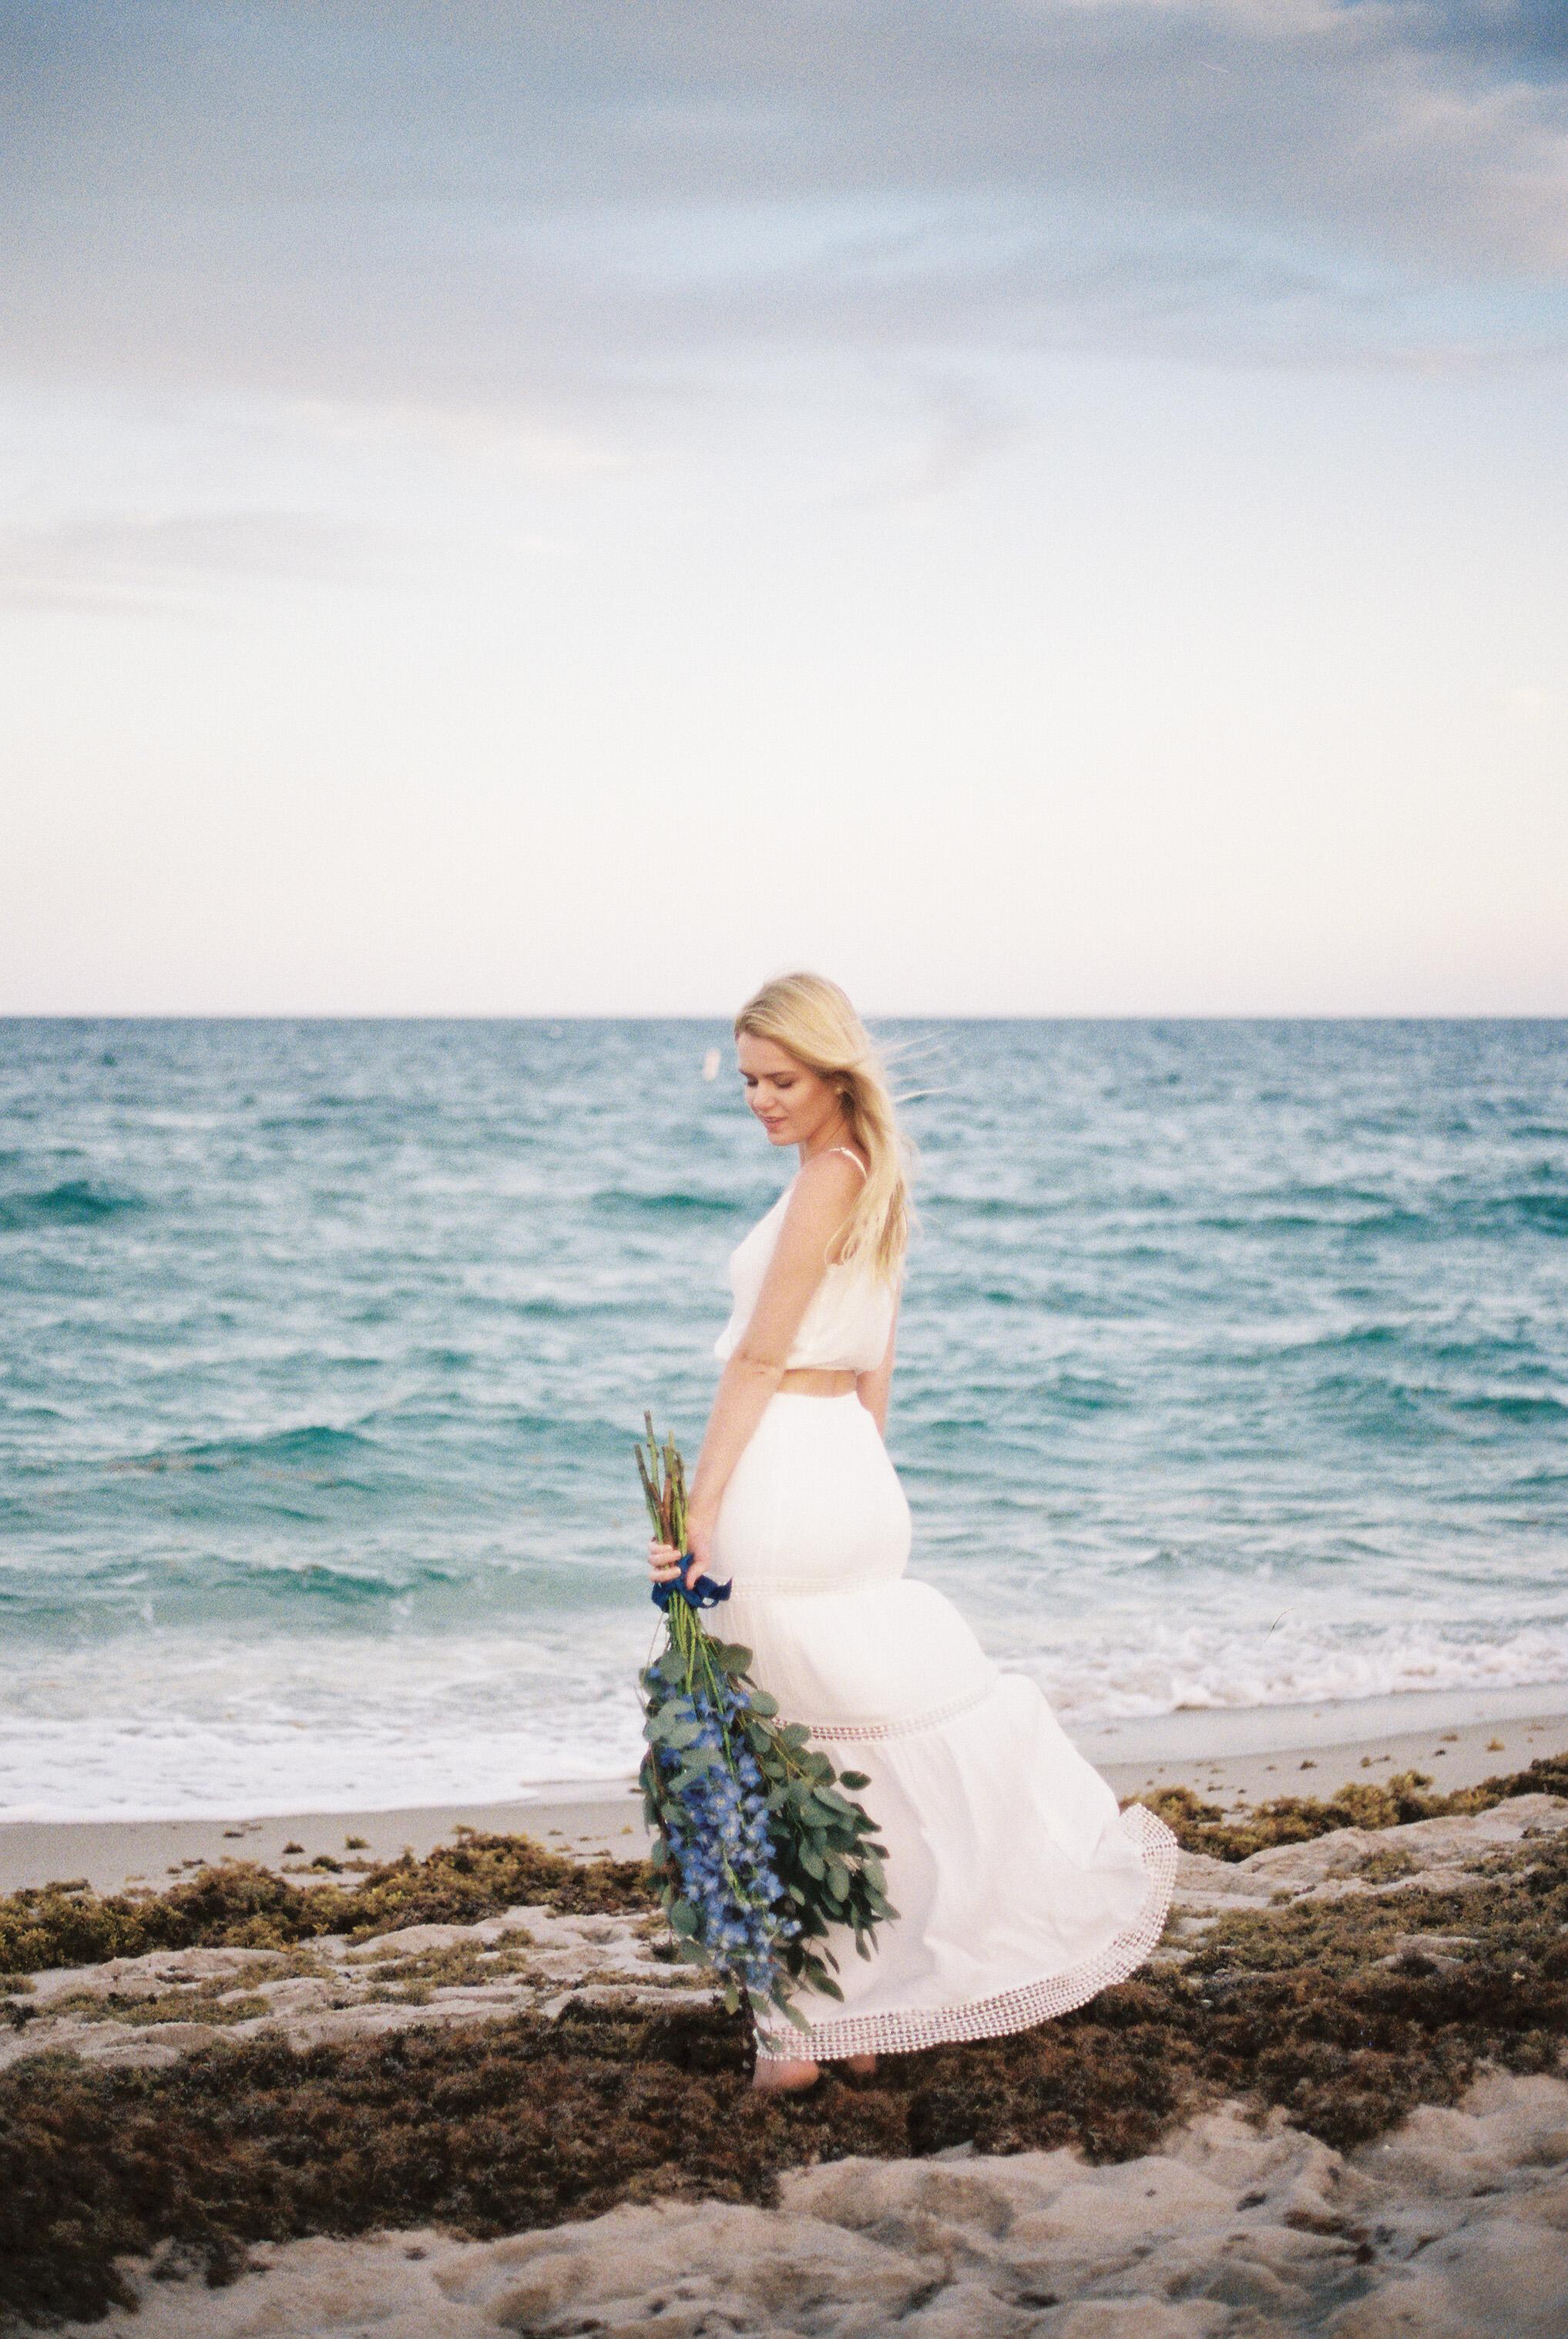 sauphia-germain-photography-lauderdale-by-the-sea-4.jpg